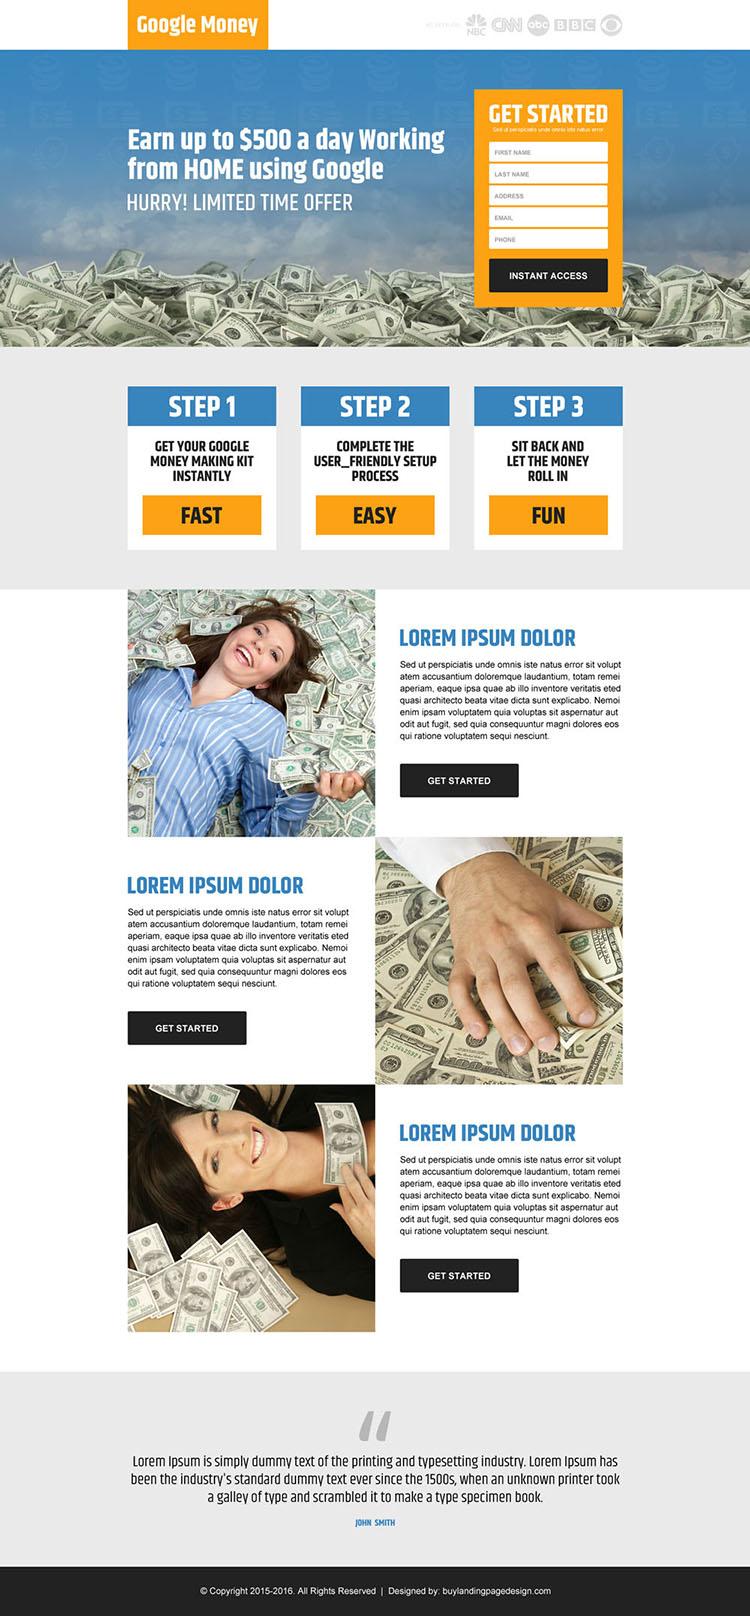 google money clean lead generating landing page design